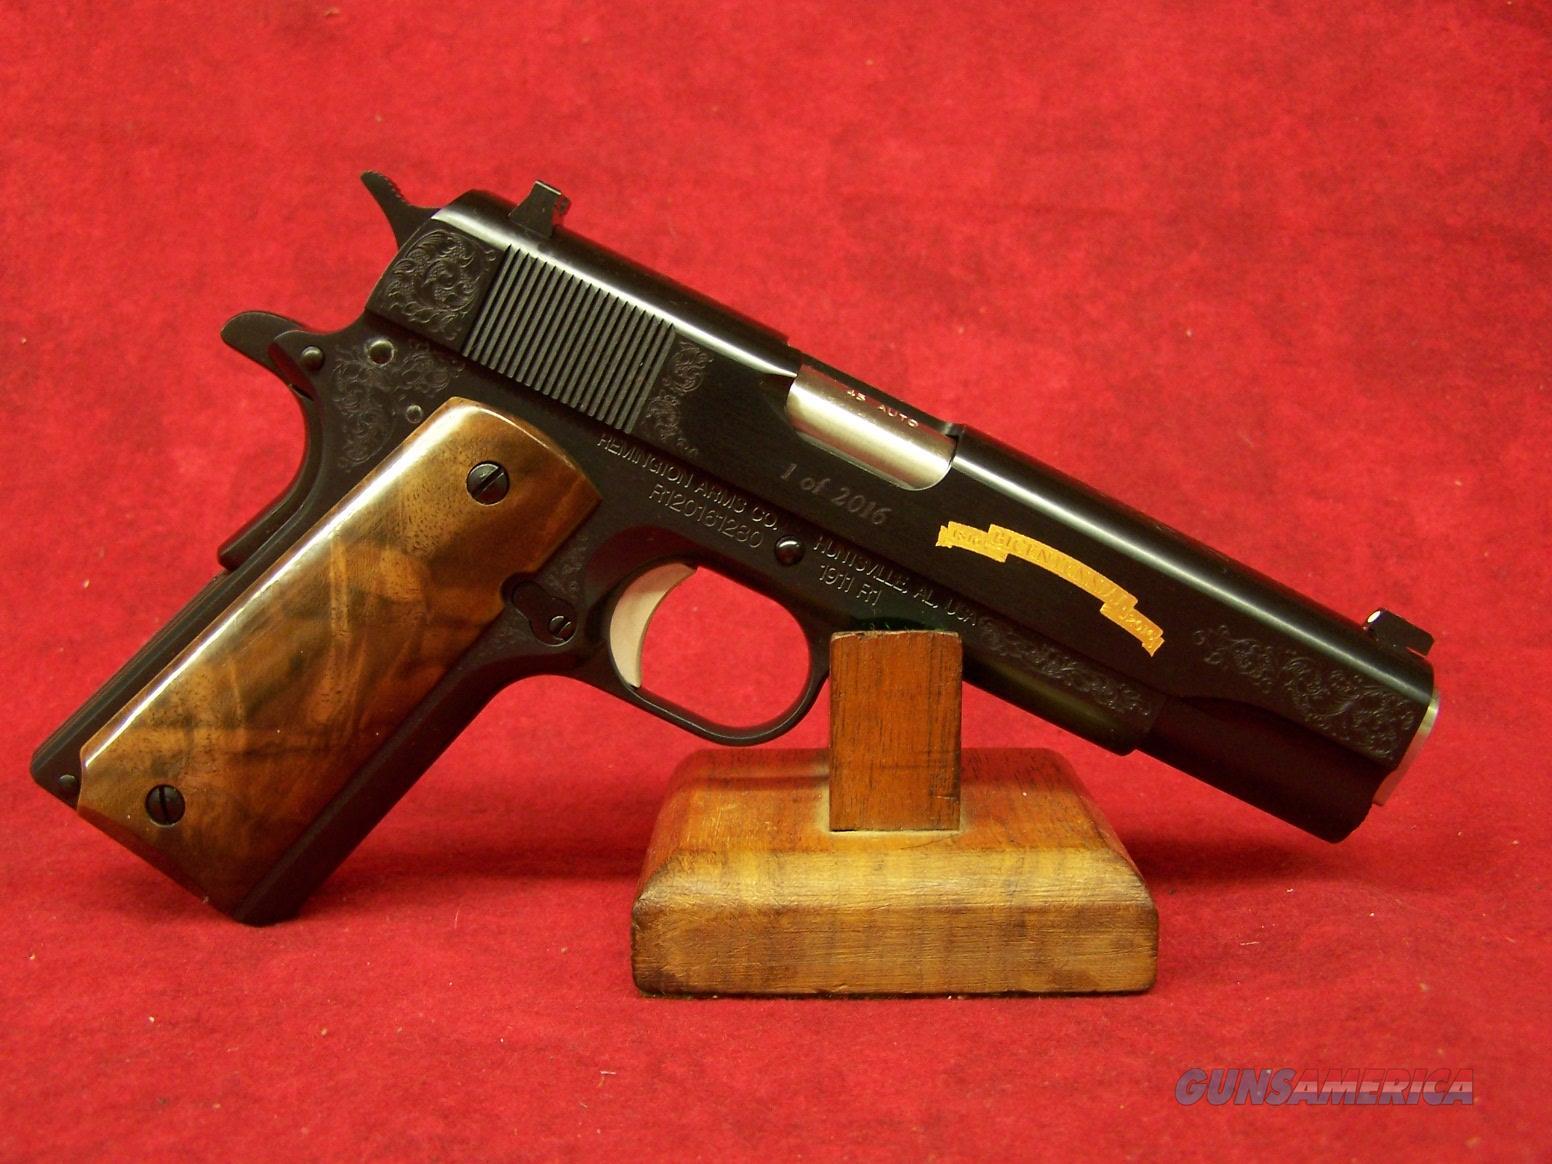 "REMINGTON R1 1911 200TH C GRADE 5"" 45ACP (96372)  Guns > Pistols > Remington Pistols - Modern > 1911"